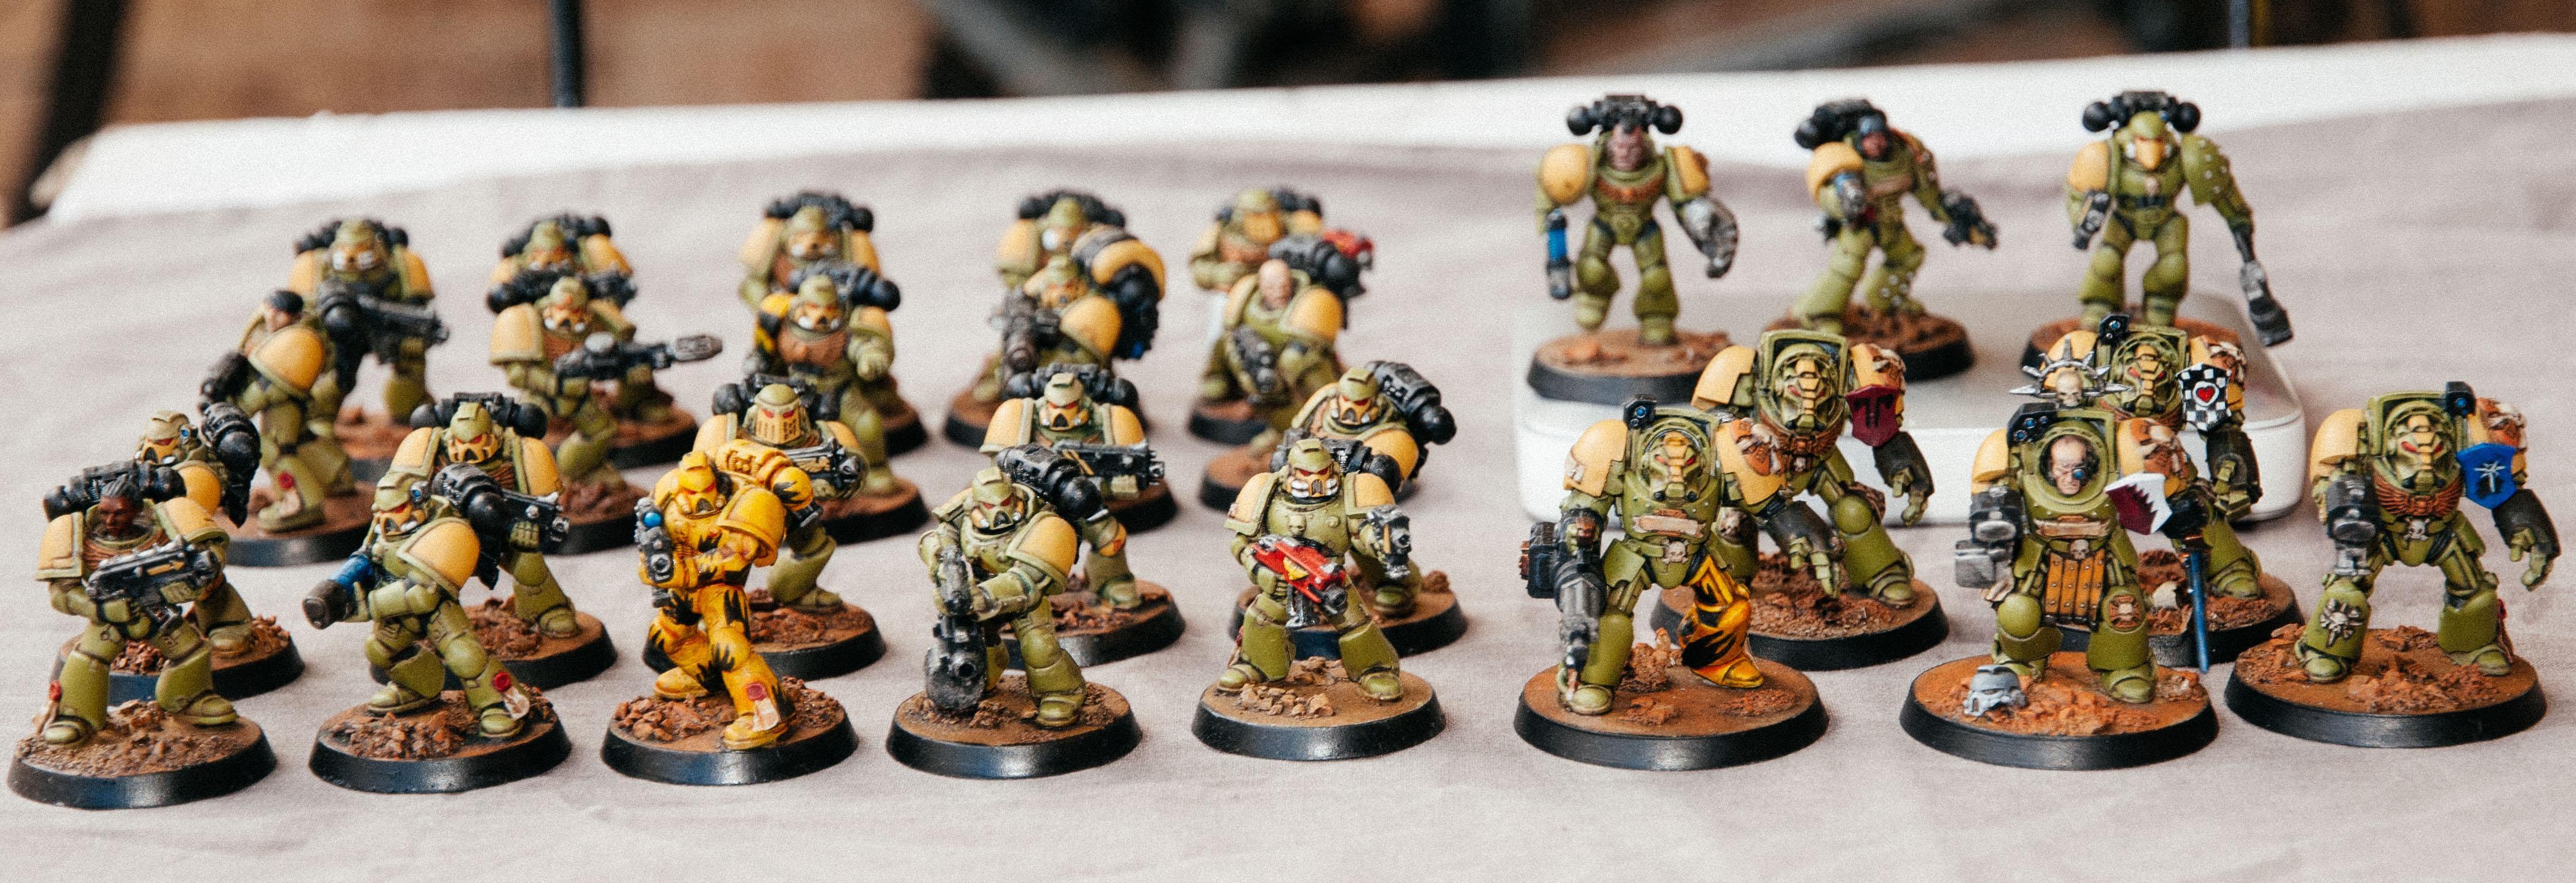 Command, Lieutenants, Mantis Warriors, Space Marines, Tactical Squad, Terminator Armor, Veteran